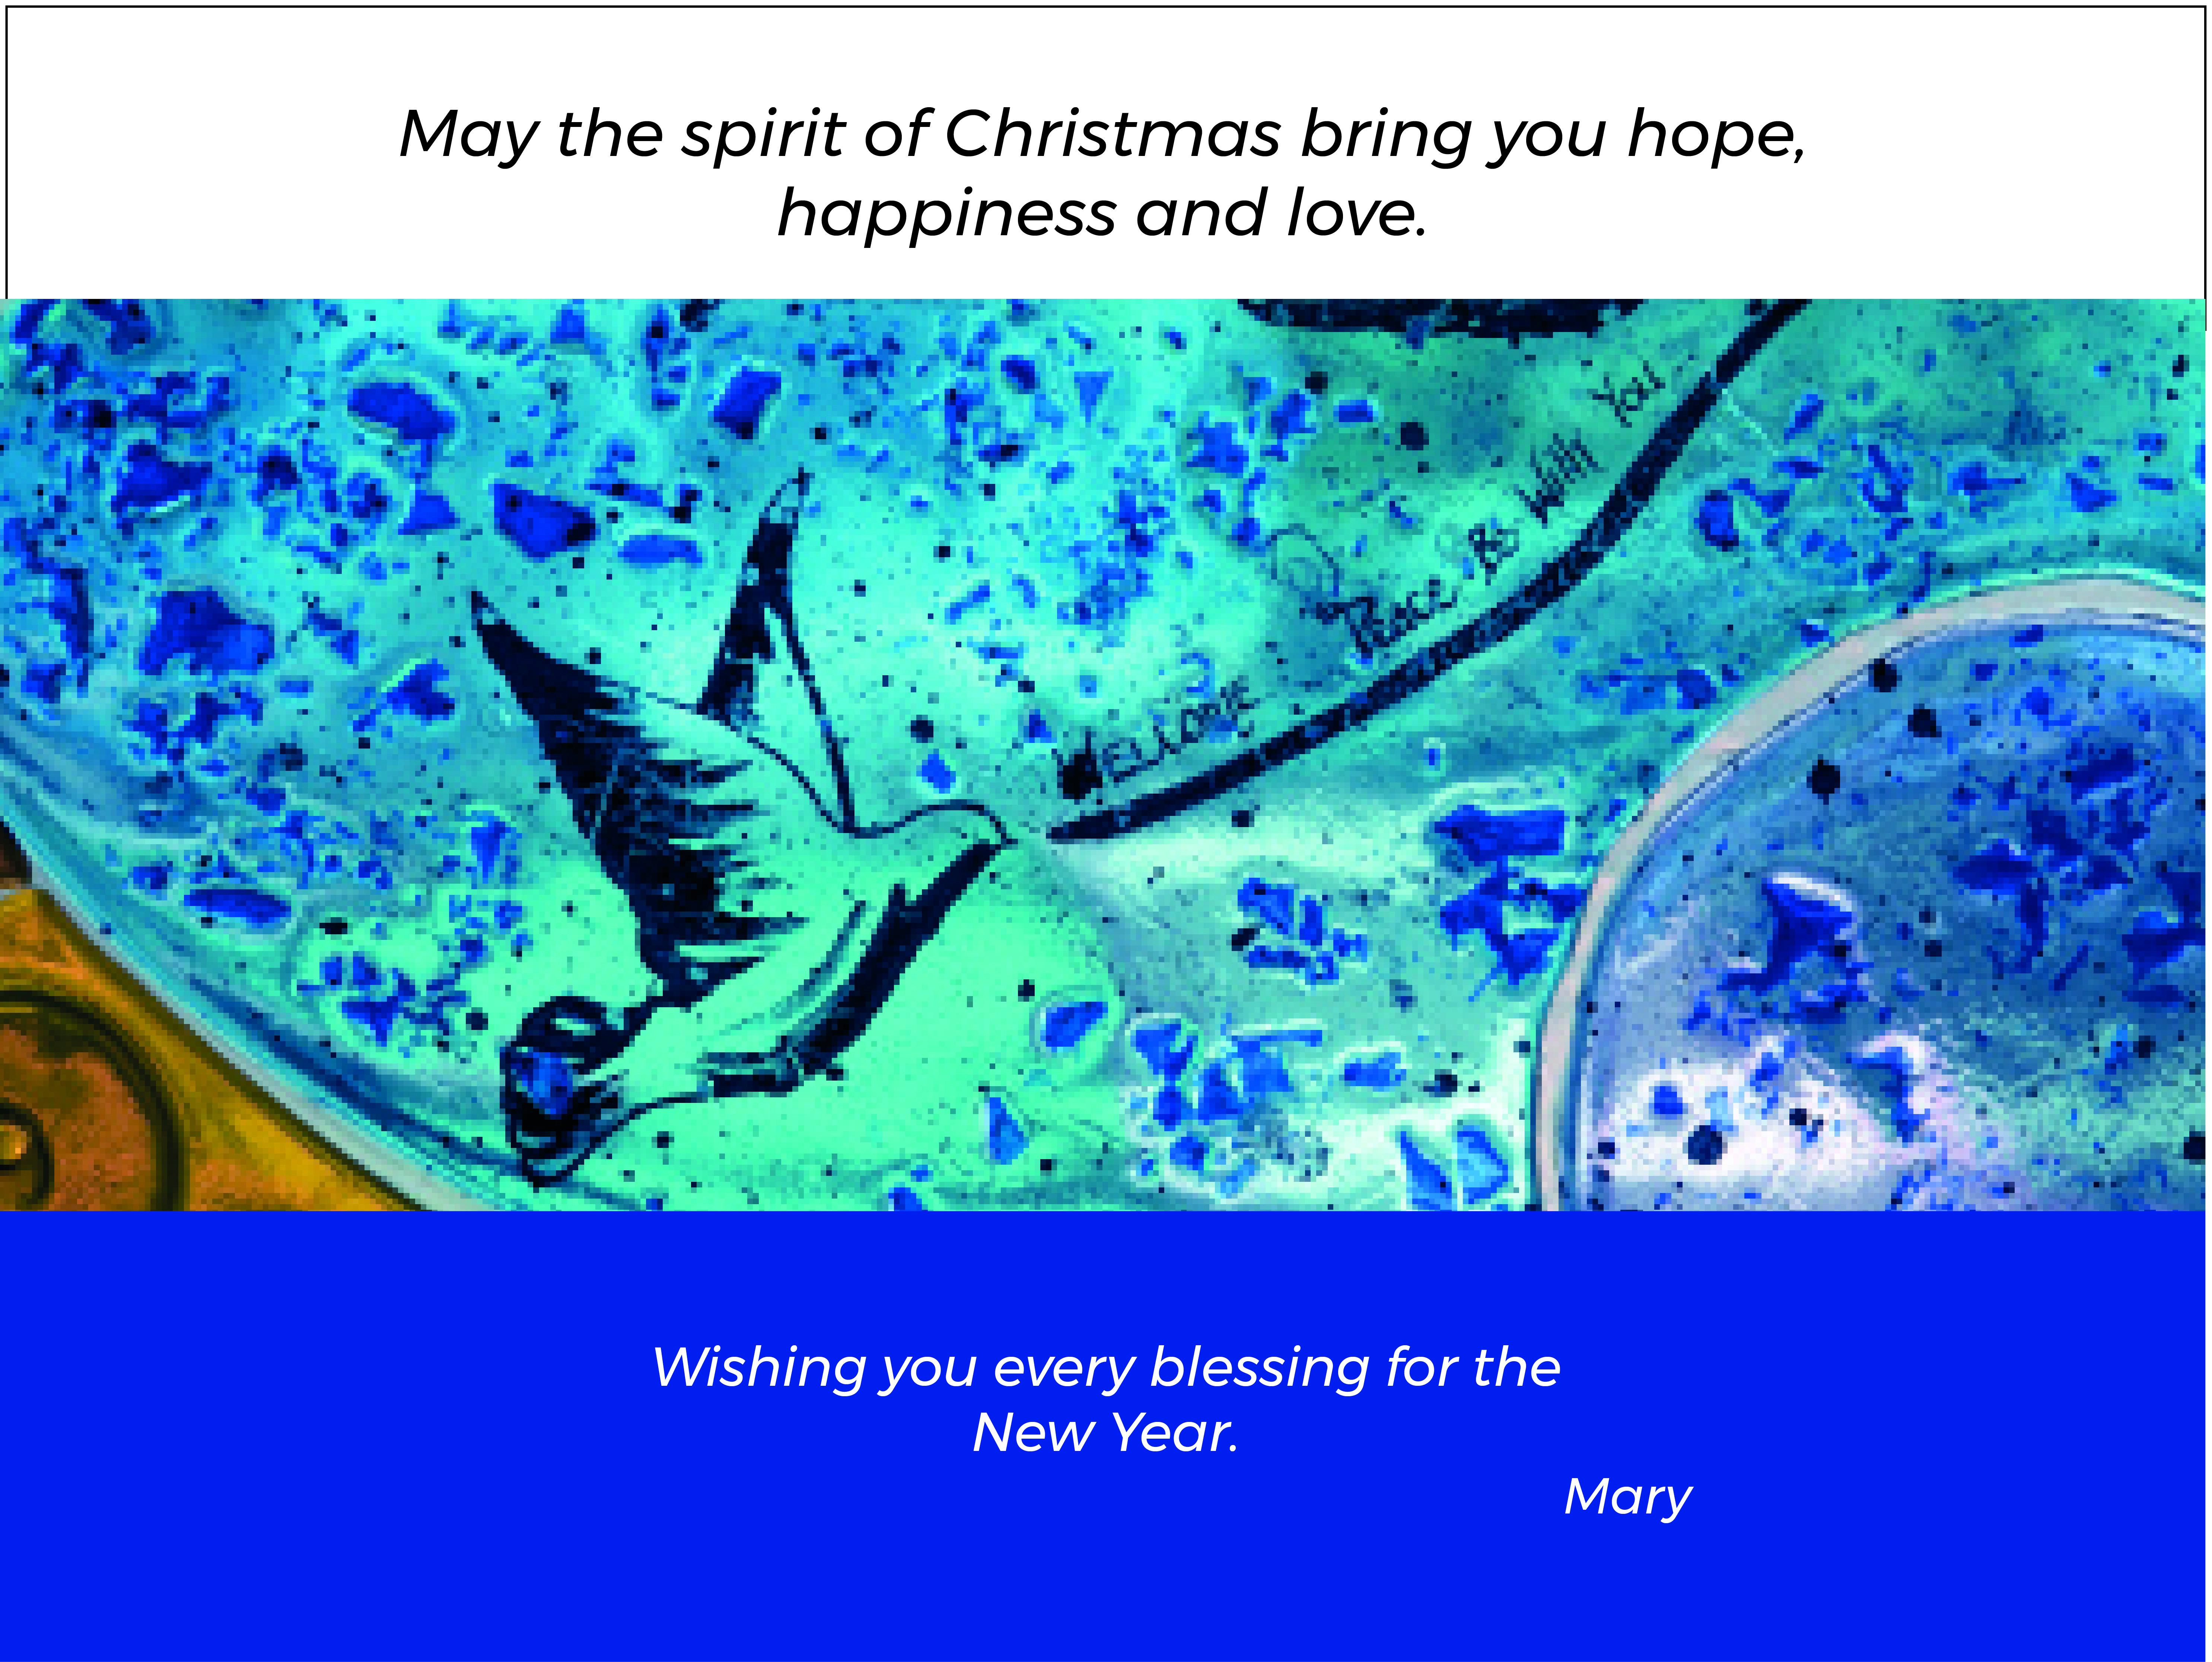 MCC-Christmas-e-Card-2019_Message-2_FINAL